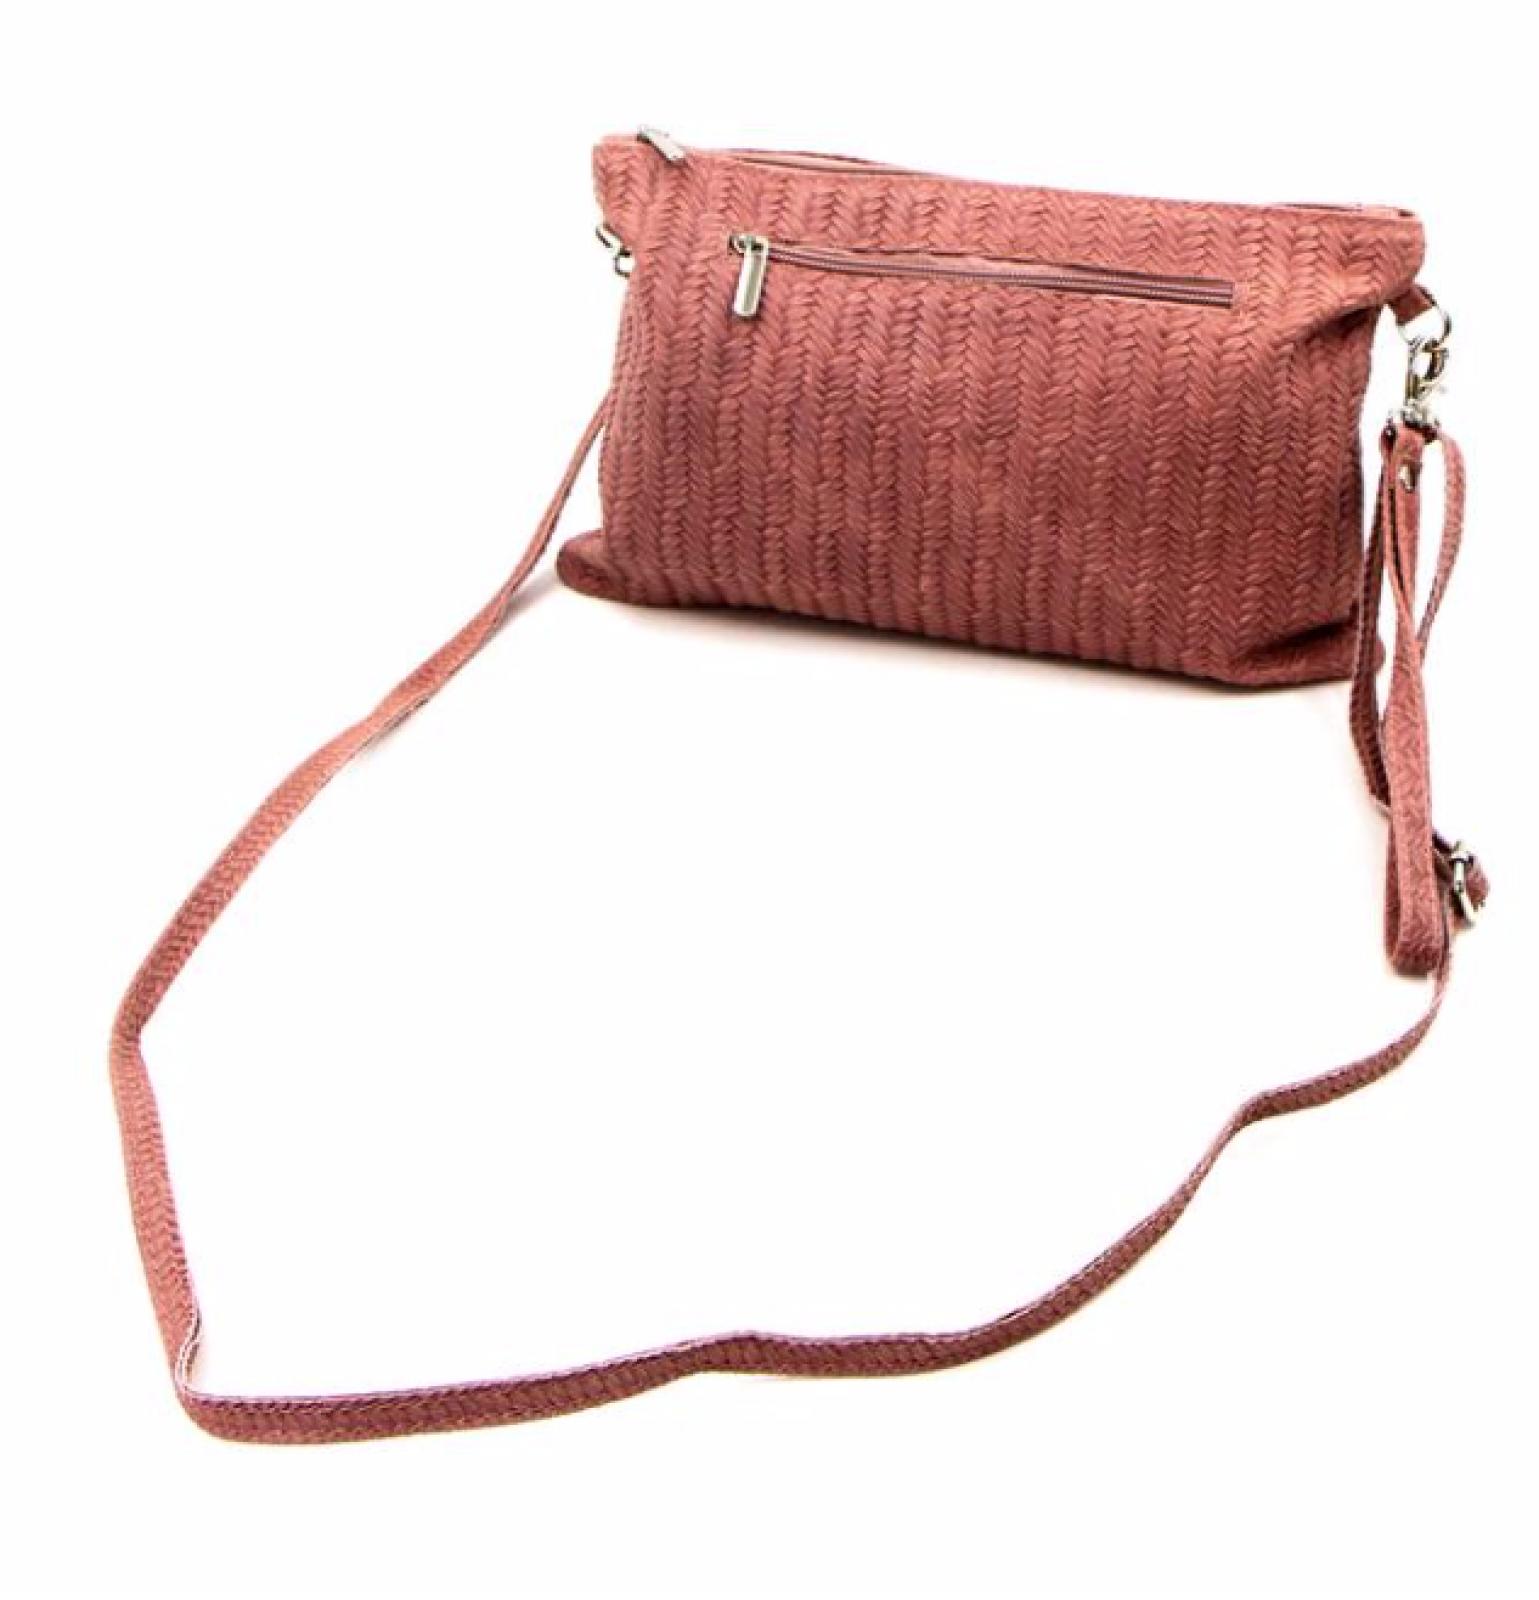 Leather Woven Crossbody Handbag - Blush thumbnails